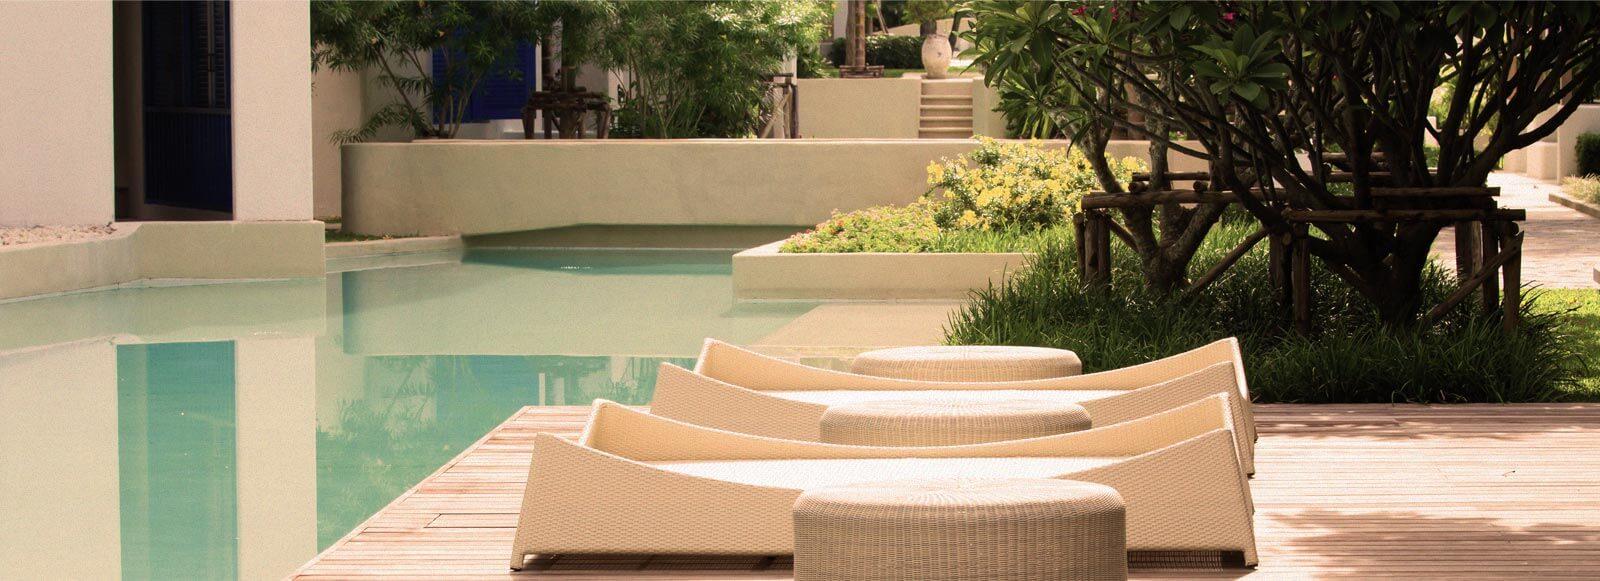 Pool Area - Lauren Sencion